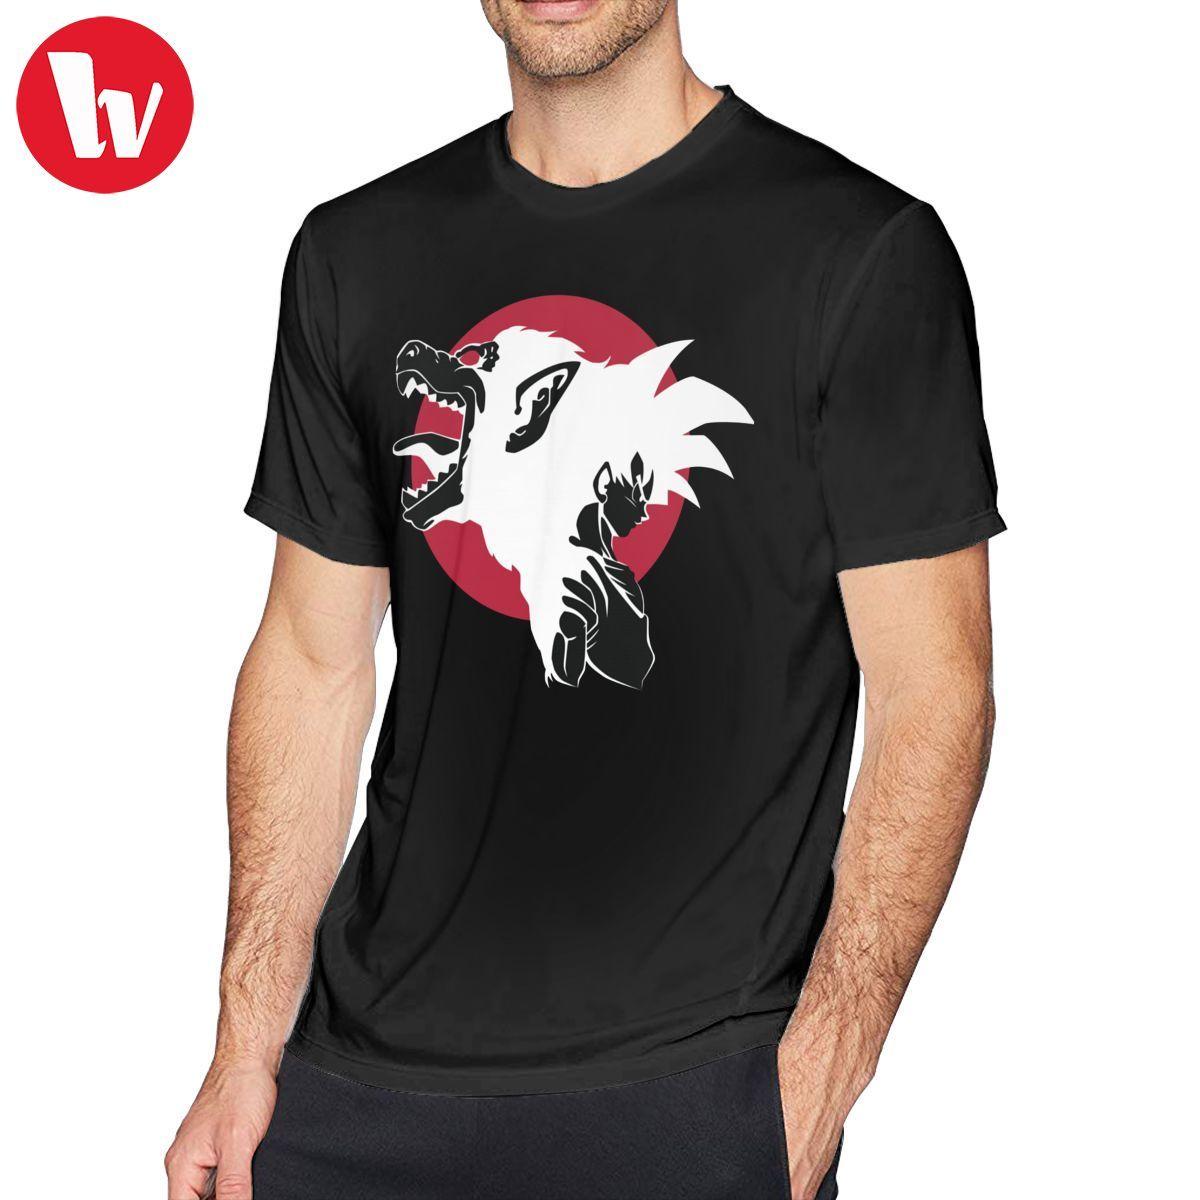 Camiseta de Korn, Super camiseta con mono Goku, divertida camiseta de manga corta, camiseta Casual estampada para hombres, camiseta 100 de algodón